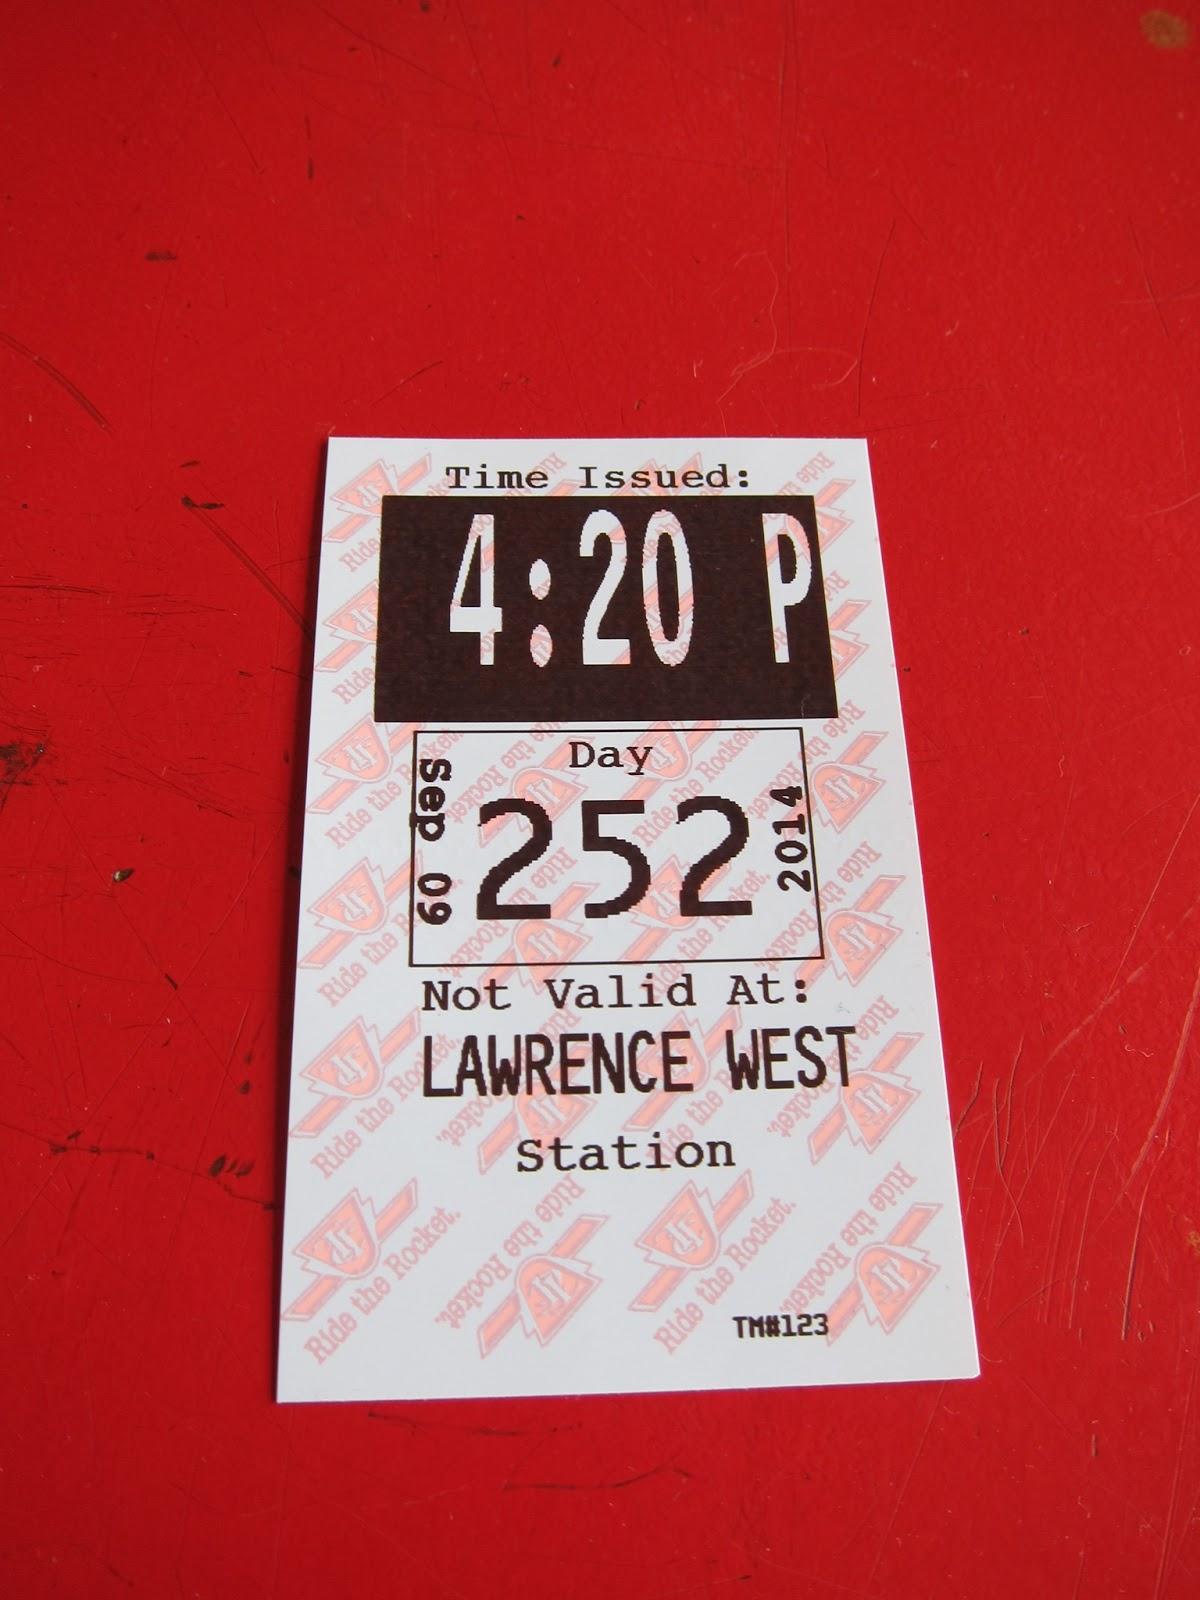 Lawrence West station transfer